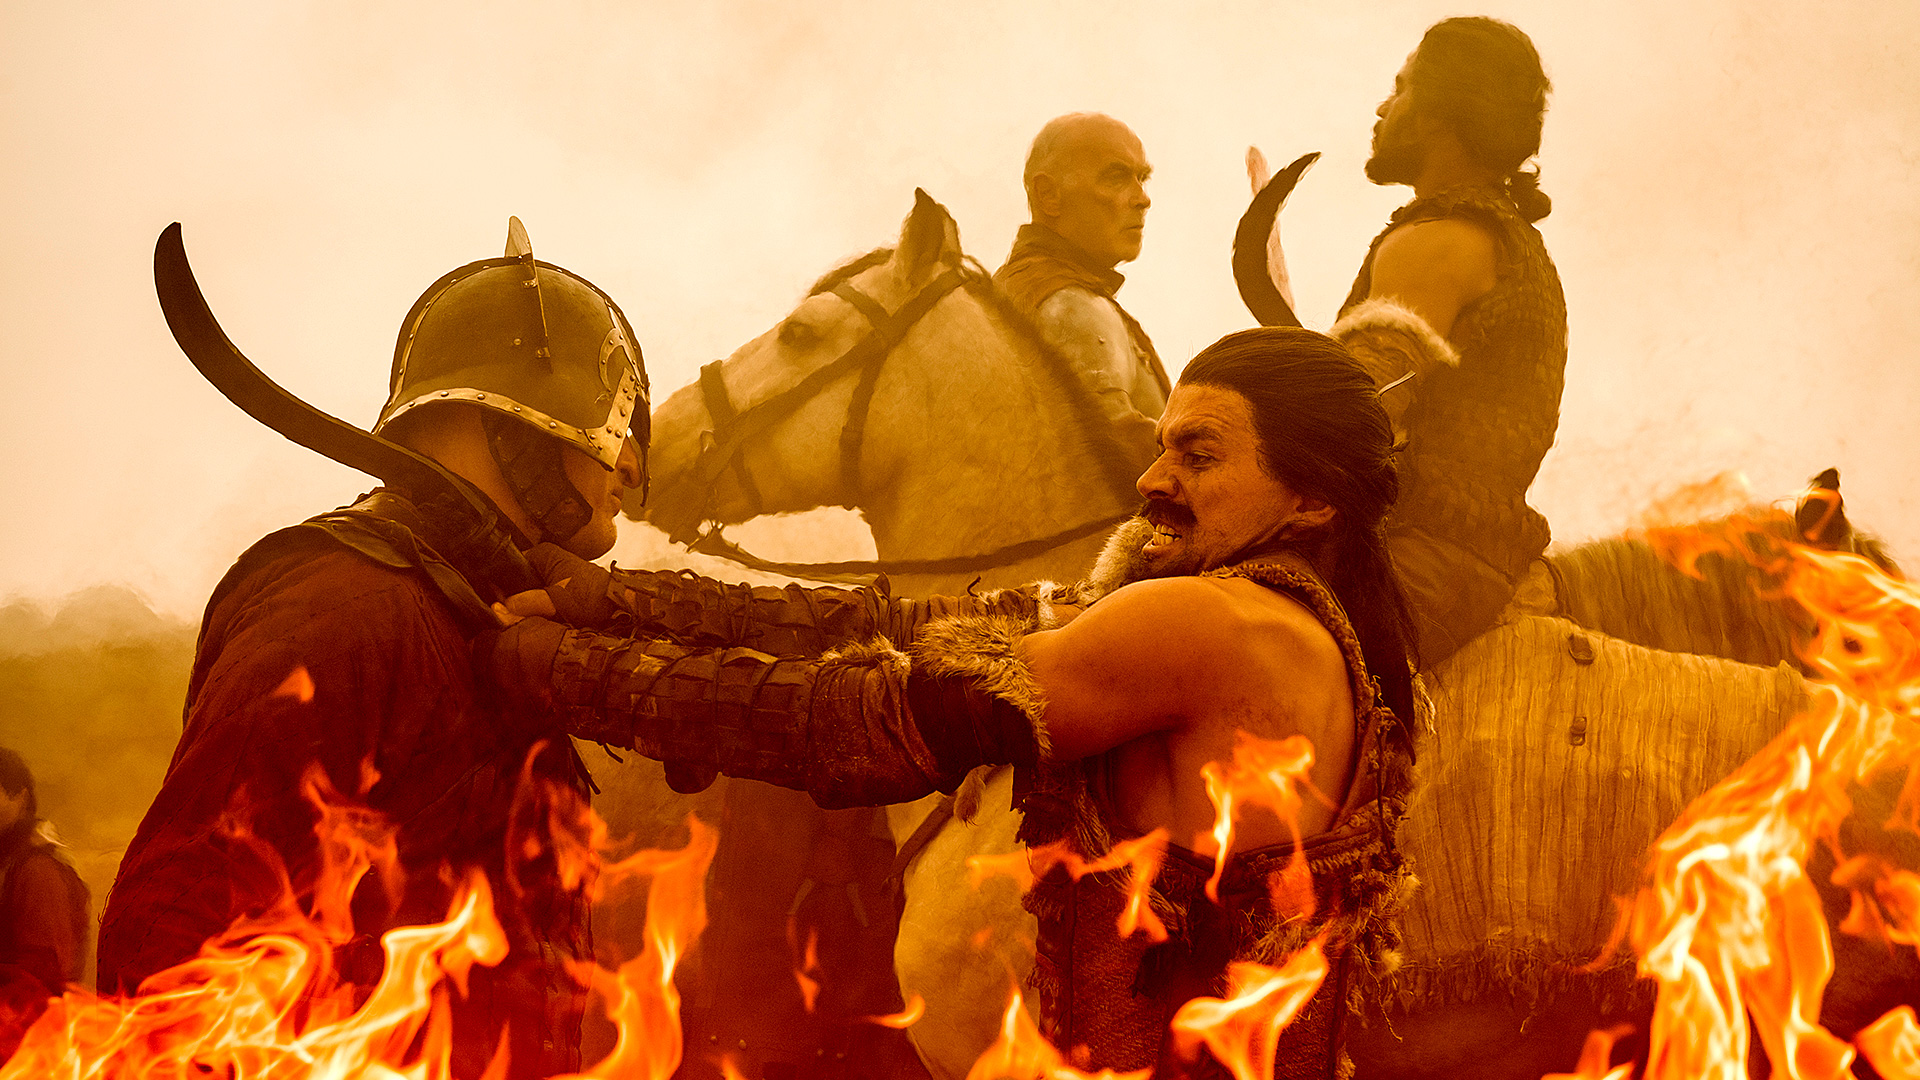 Lannister versus Dothraki The Spoils of War